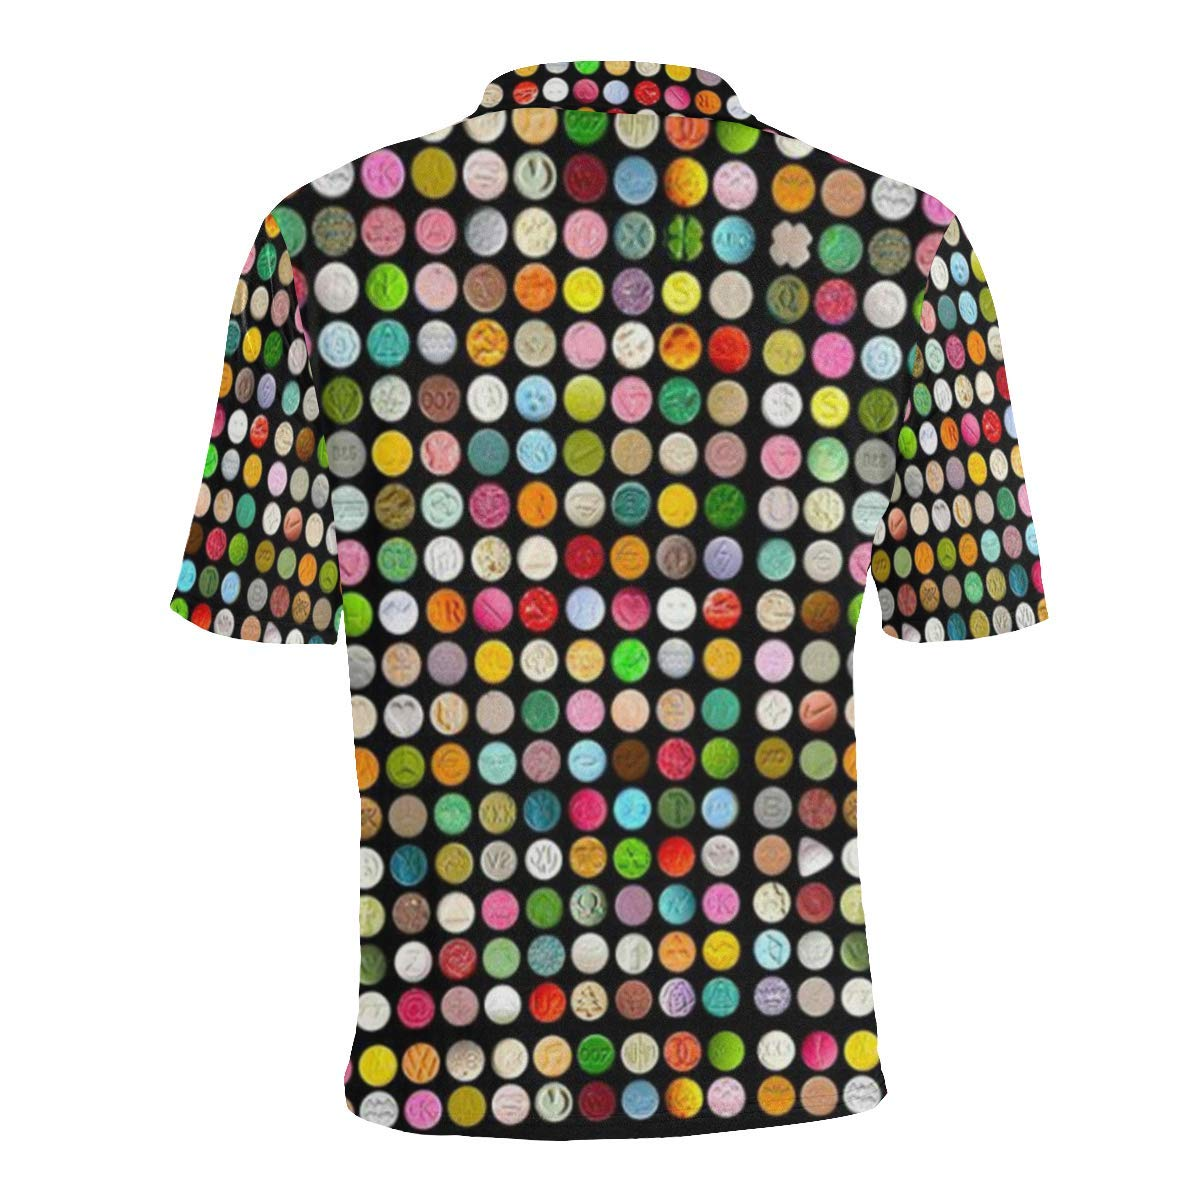 COL DOM Short Sleeve Ecstasy Pills Mens All Over Print Polo Shirt